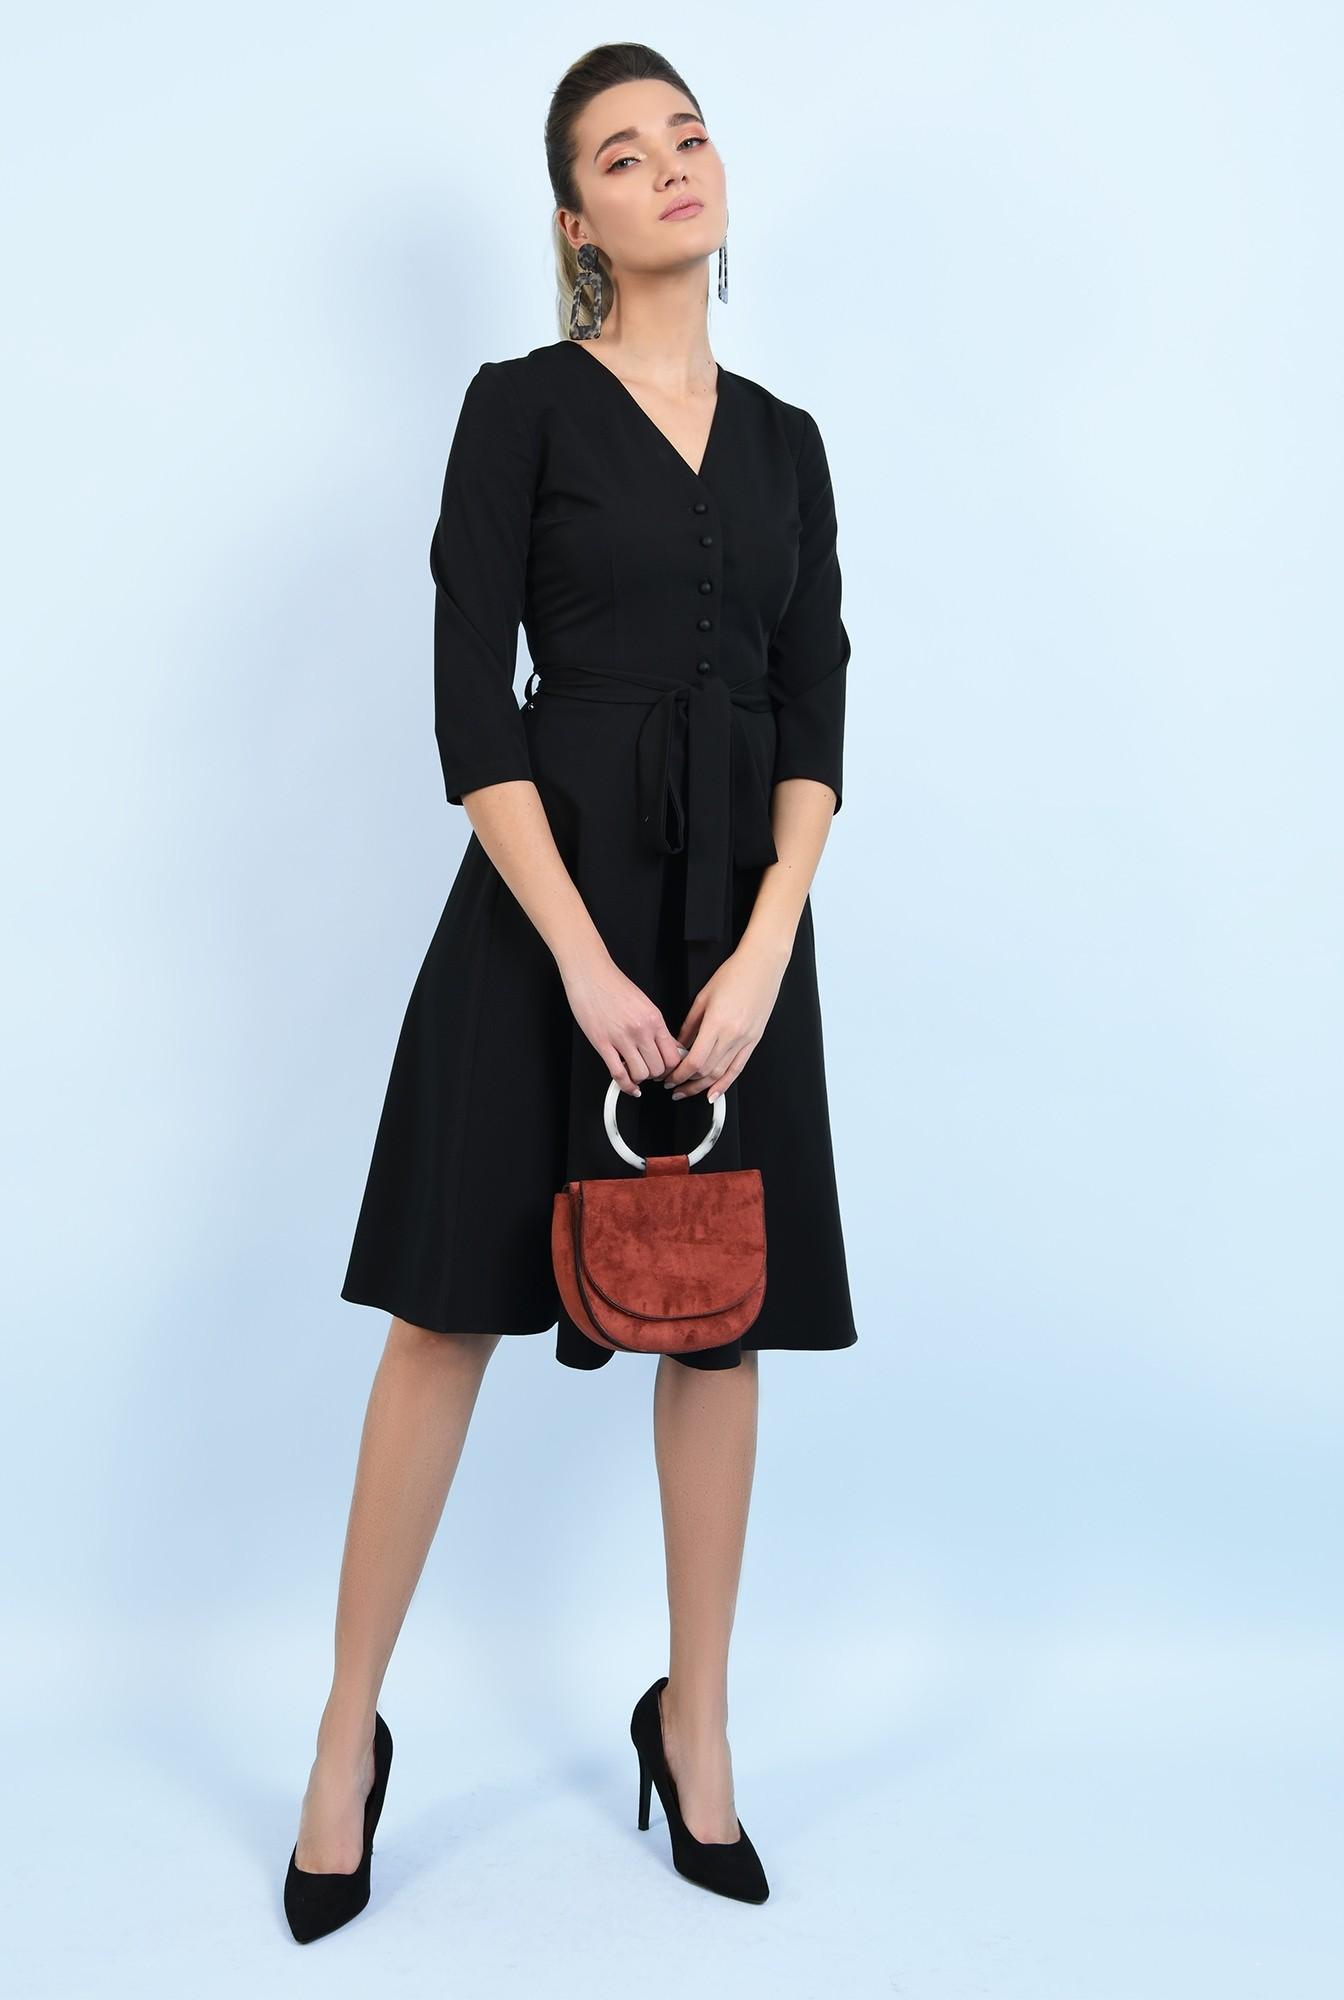 3 - 360 - rochie office, neagra, midi, cu nasturi, cu cordon